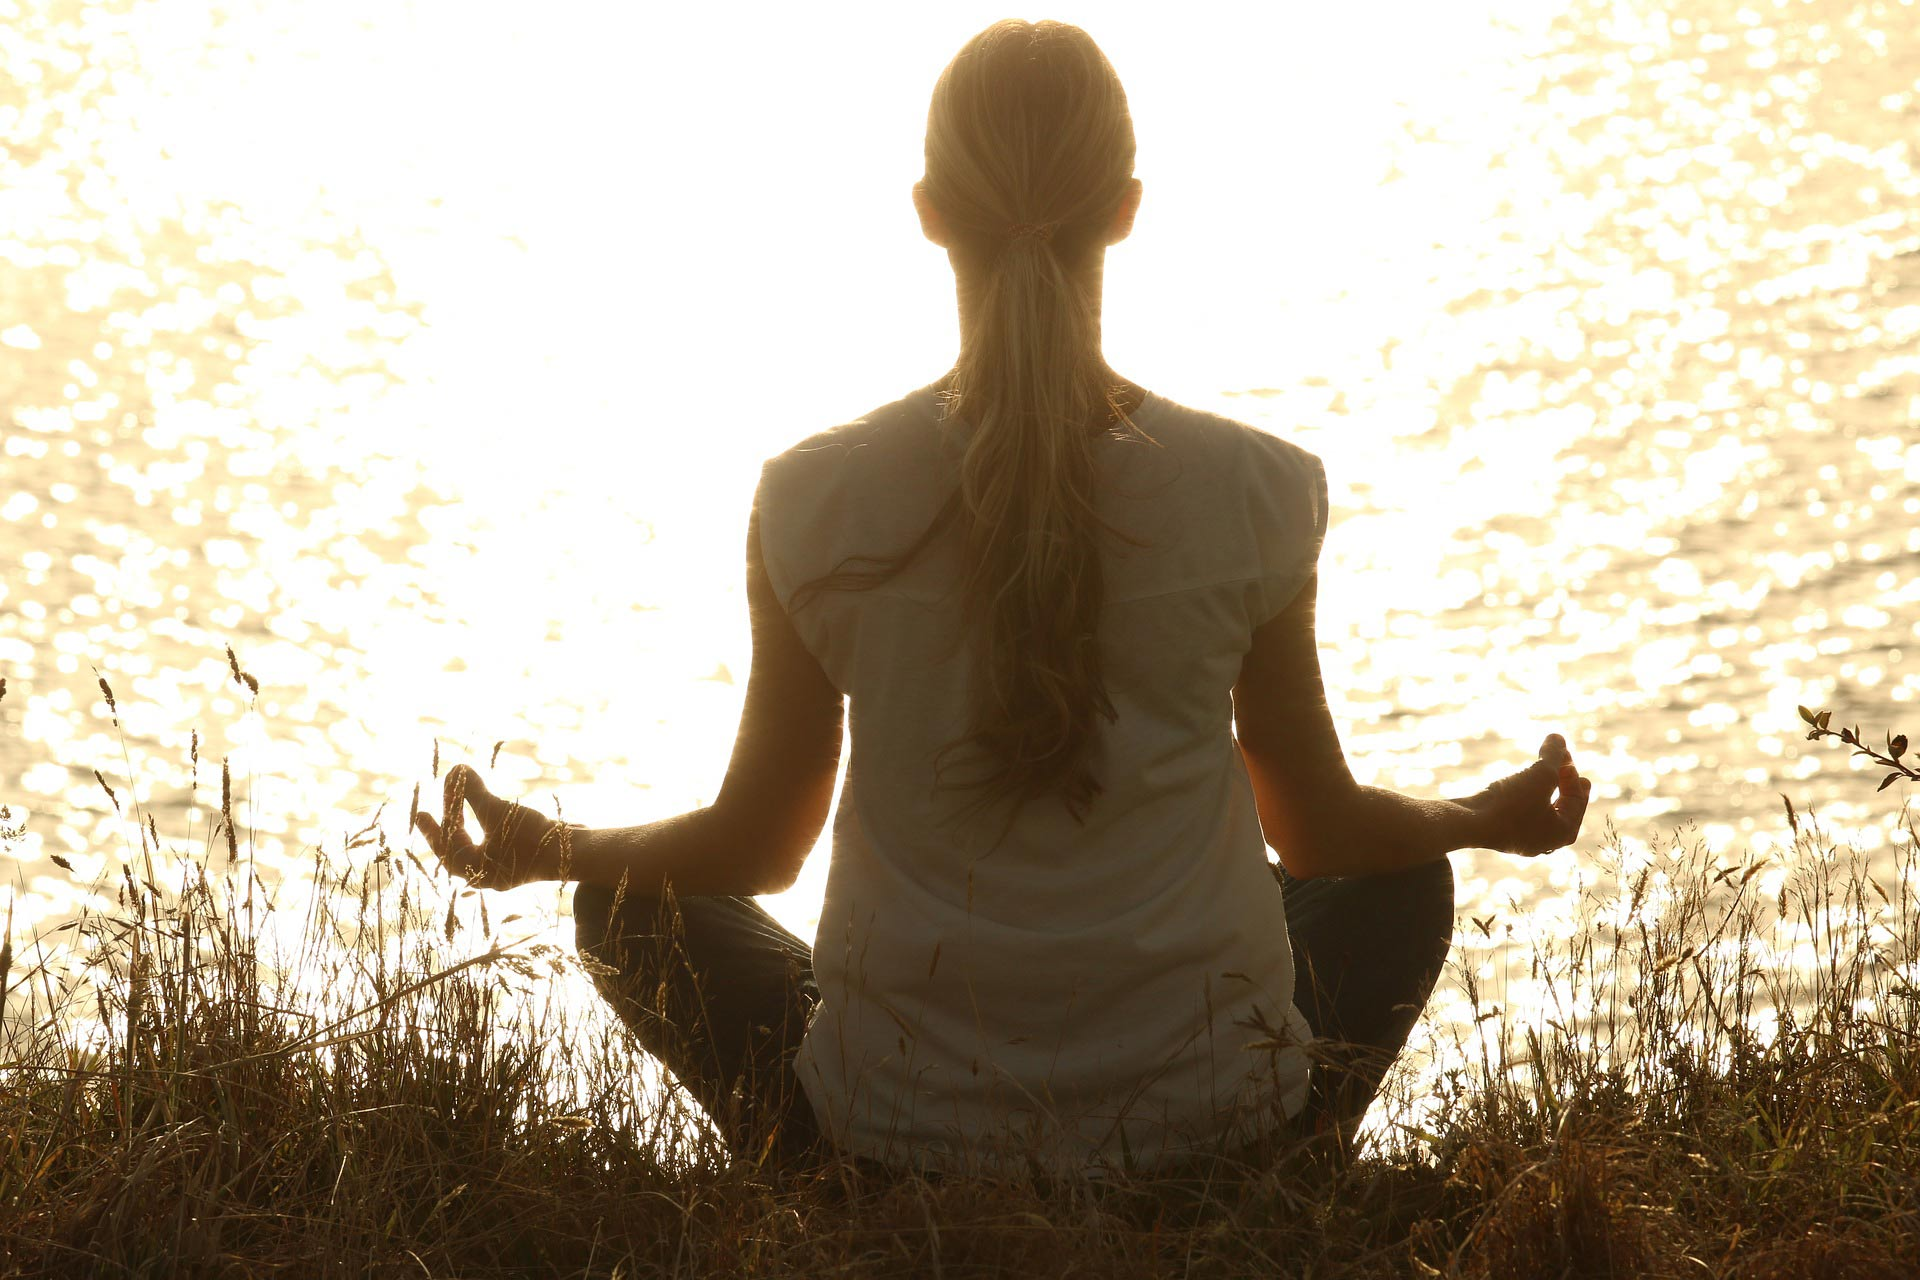 Méditation pleine conscience. cerveau, stress, amygdale, cortex préfrontal